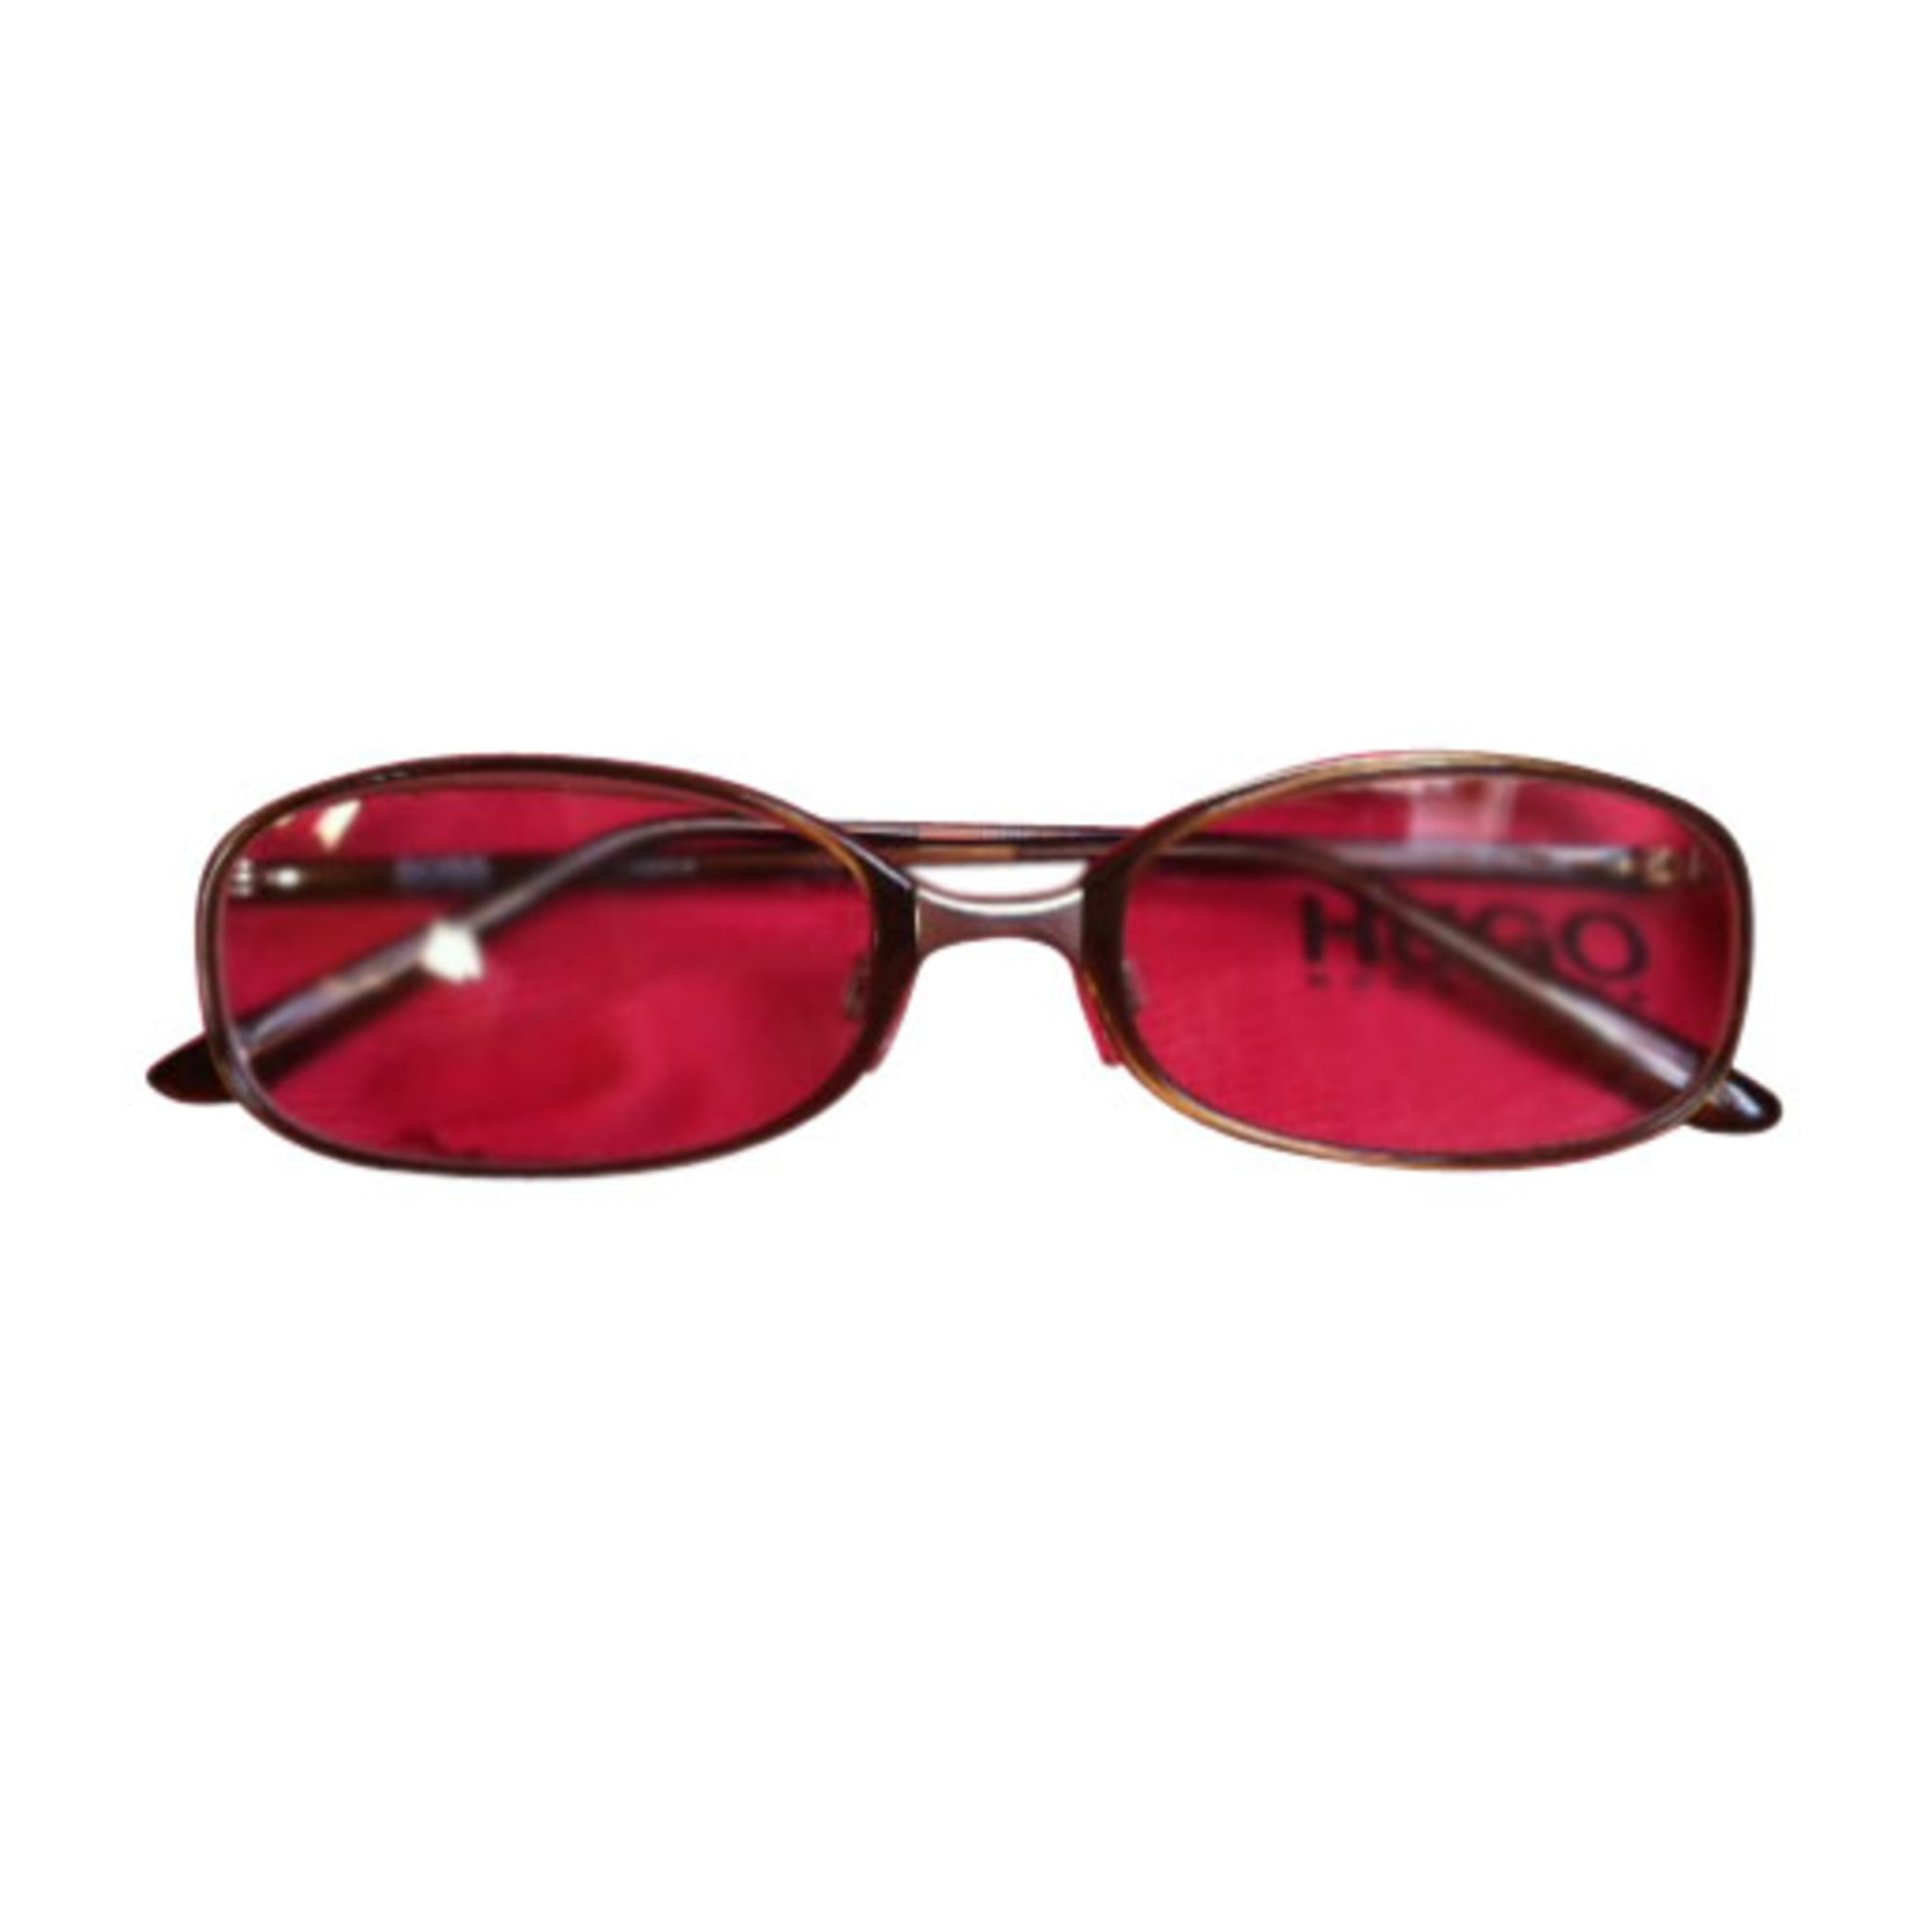 Eyeglass Frames HUGO BOSS green - 2469380